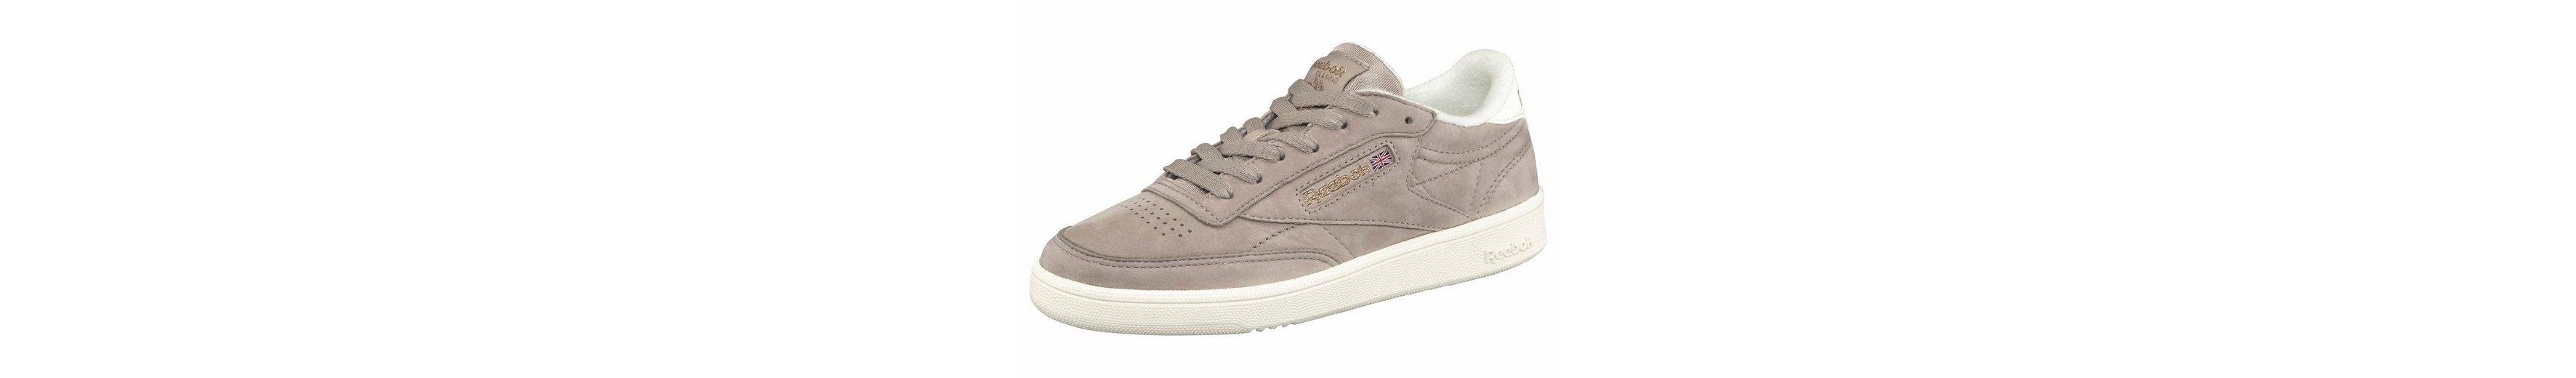 Reebok Classic Club C 85 VTG Sneaker